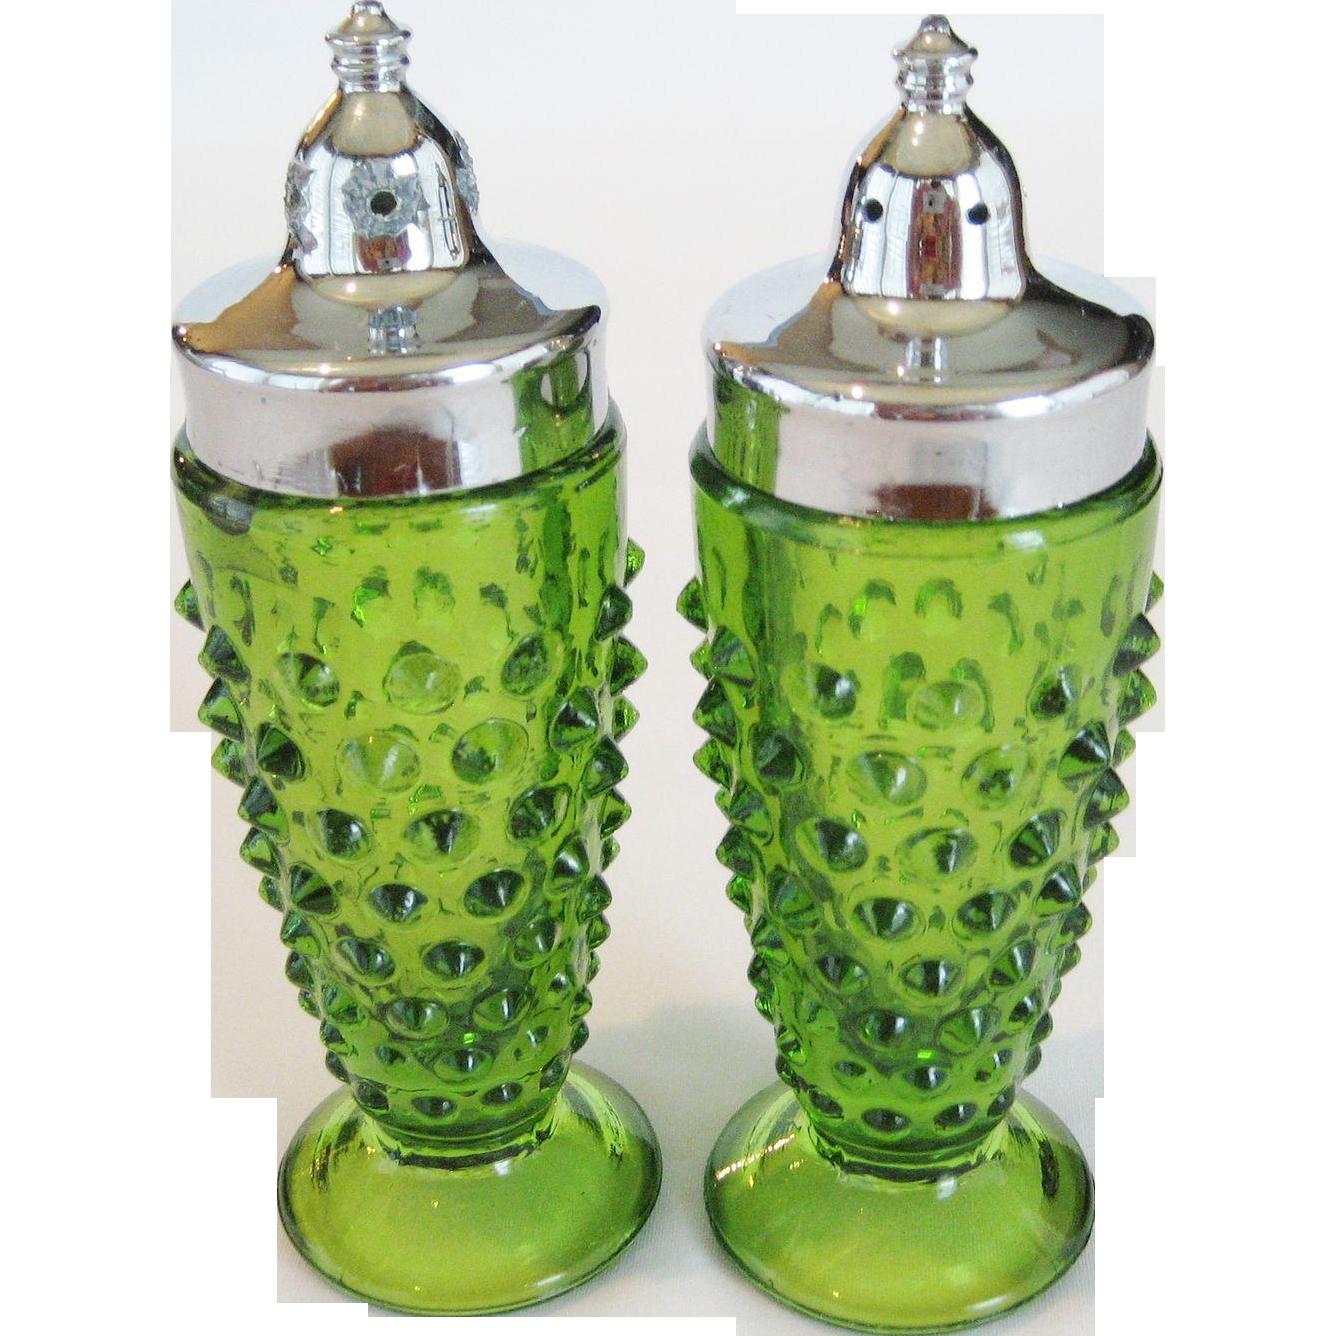 Springtime Green Hobnail Salt and Pepper Shakers